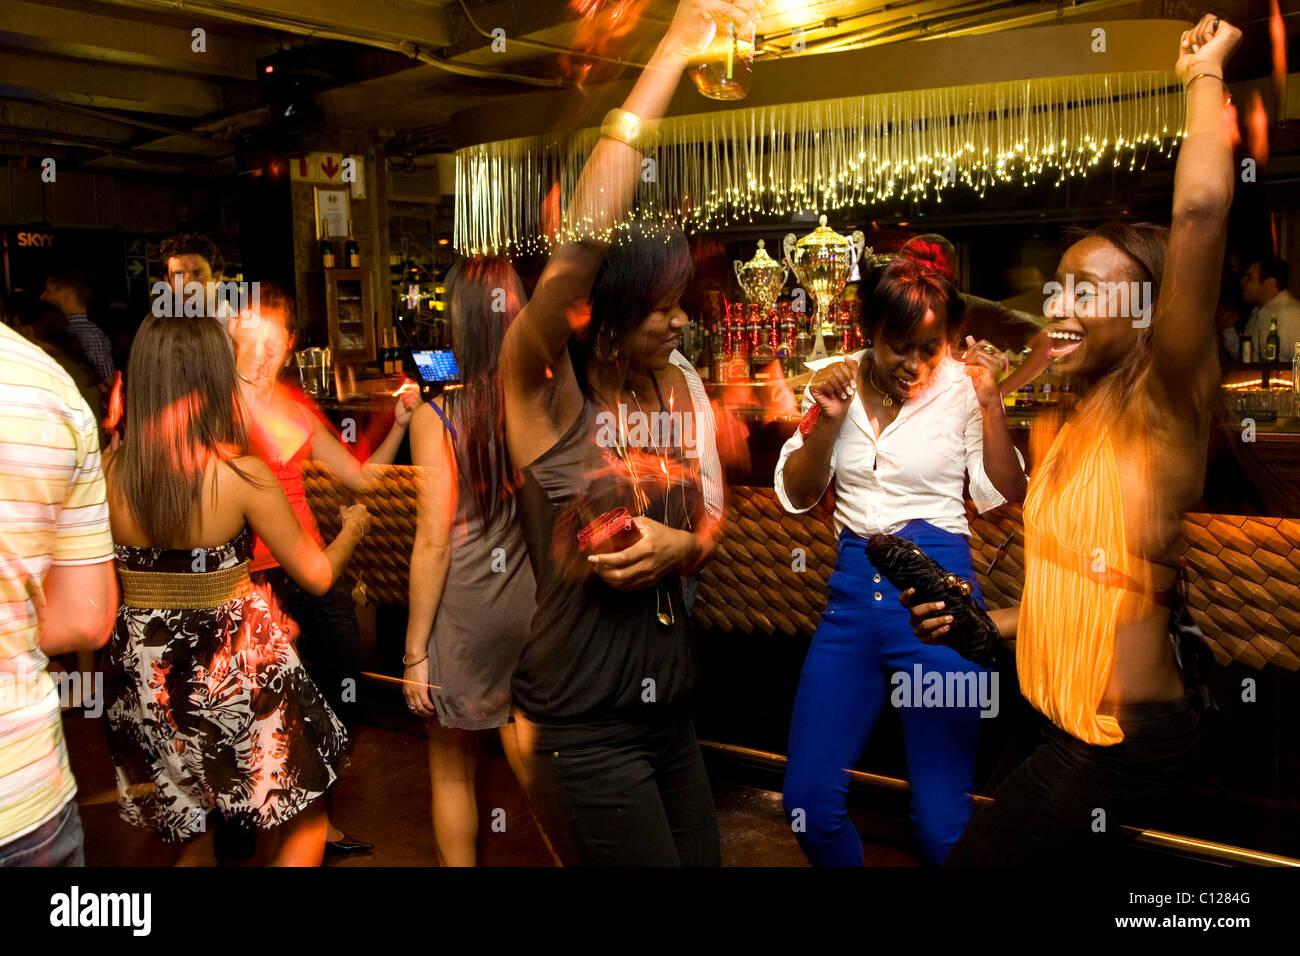 Local strip clubs in cape town